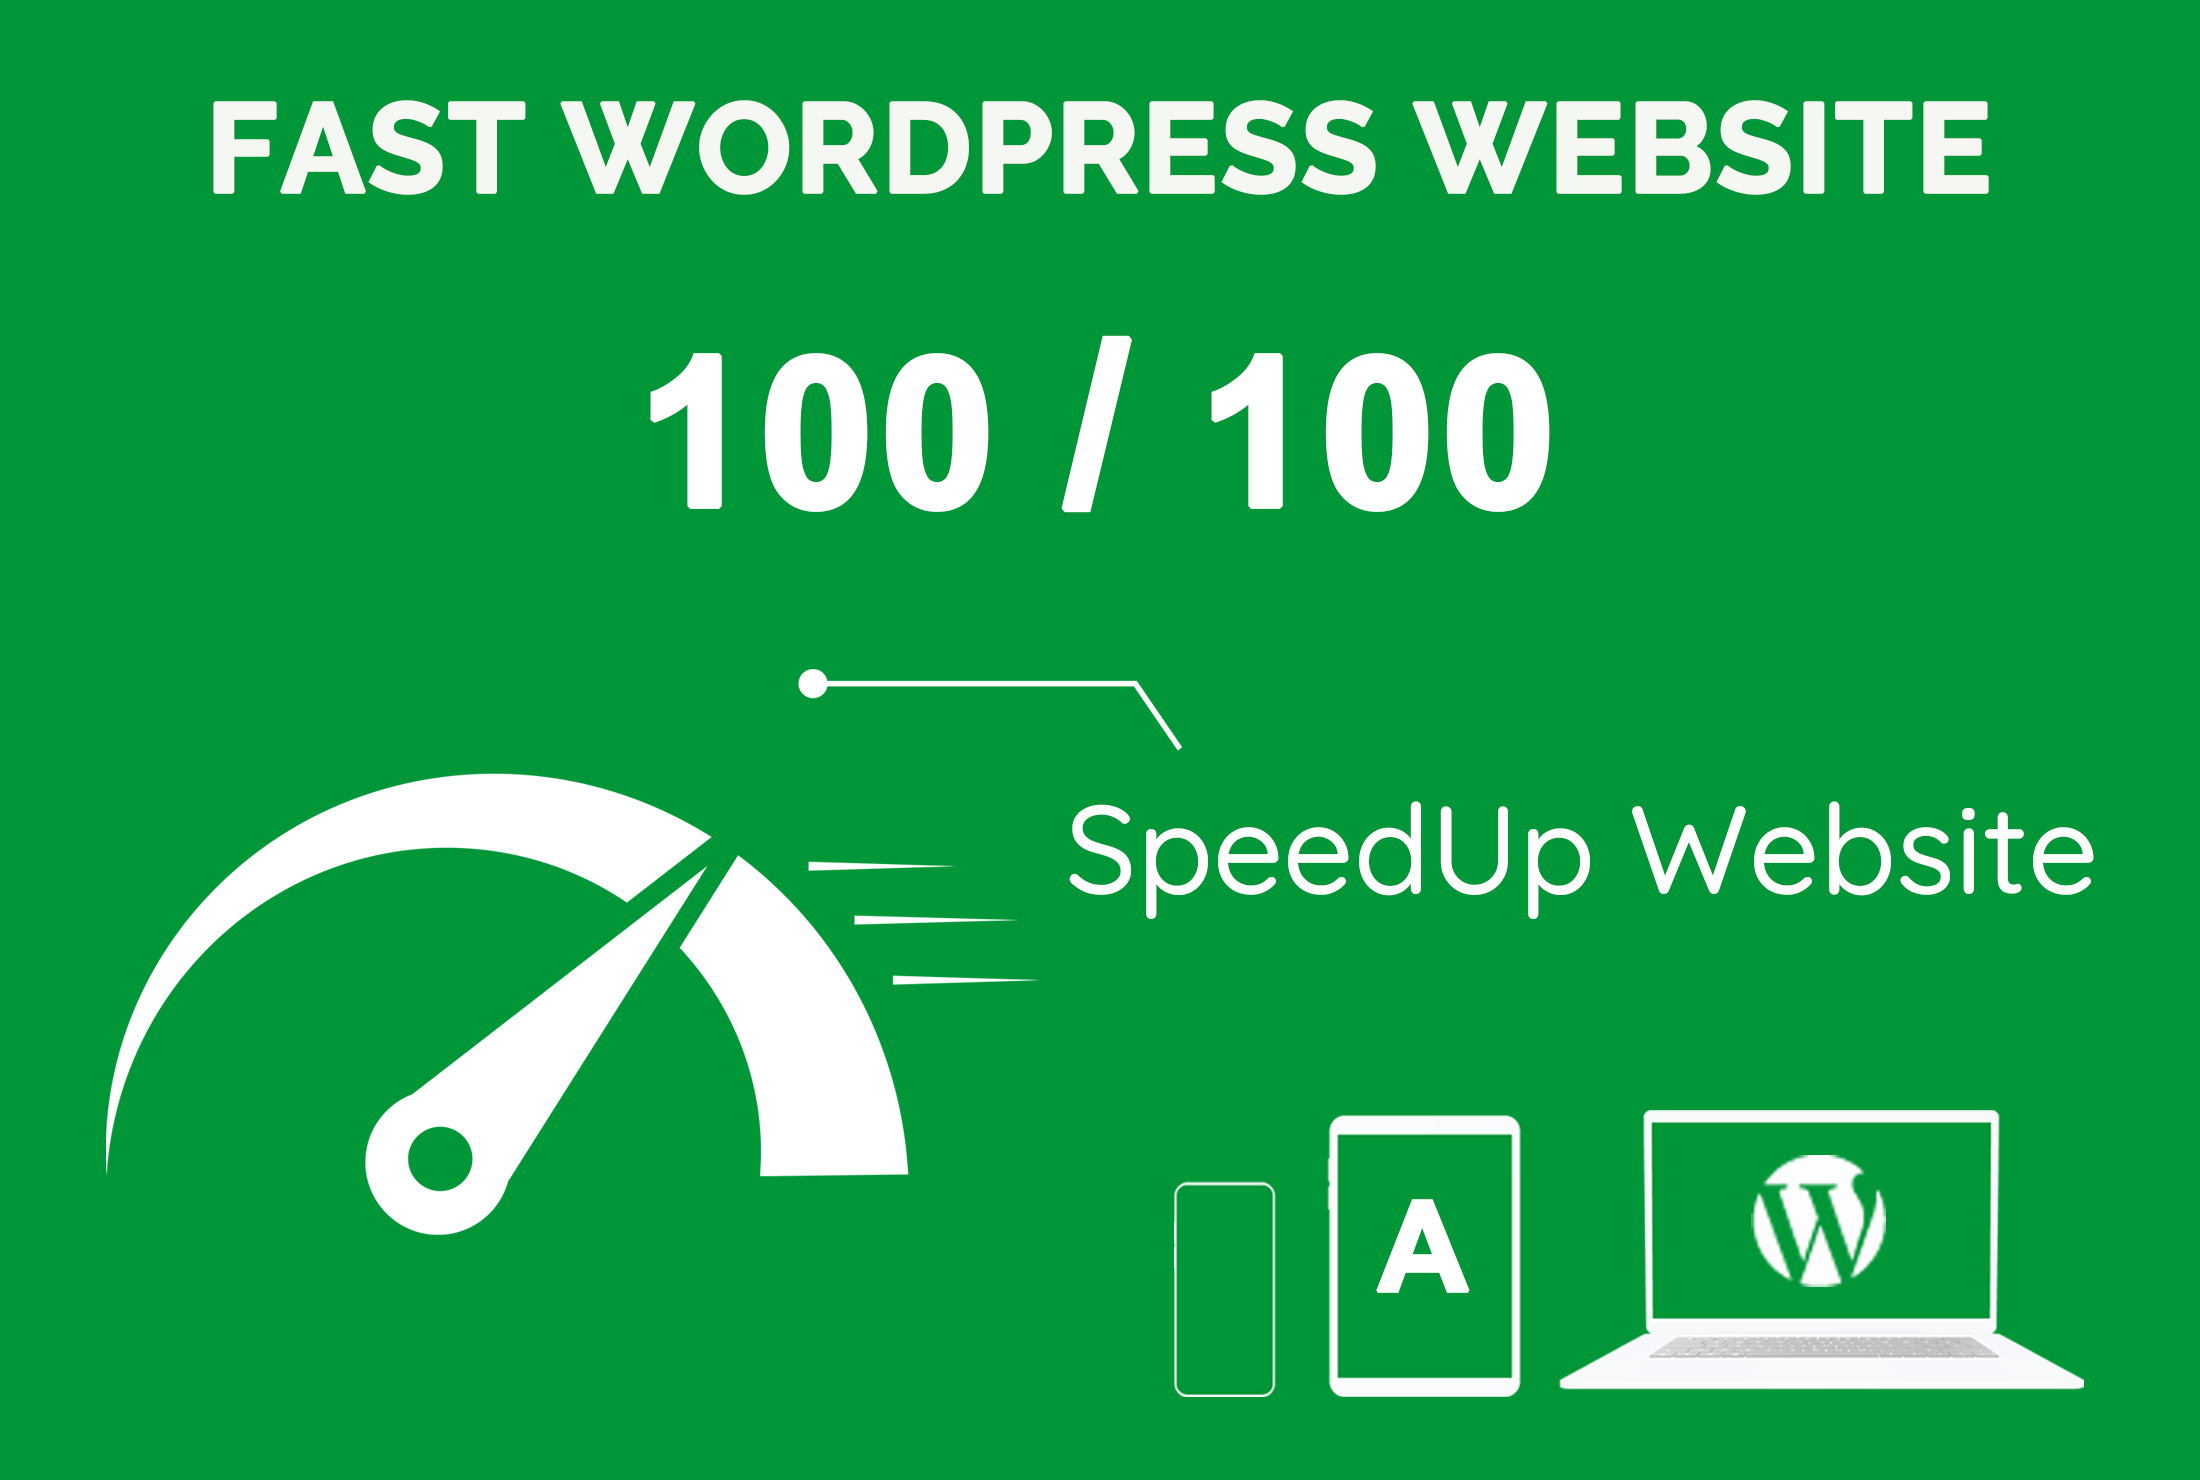 I will optimize wordpress website speed and improve gtmetrix,  google pagespeed score